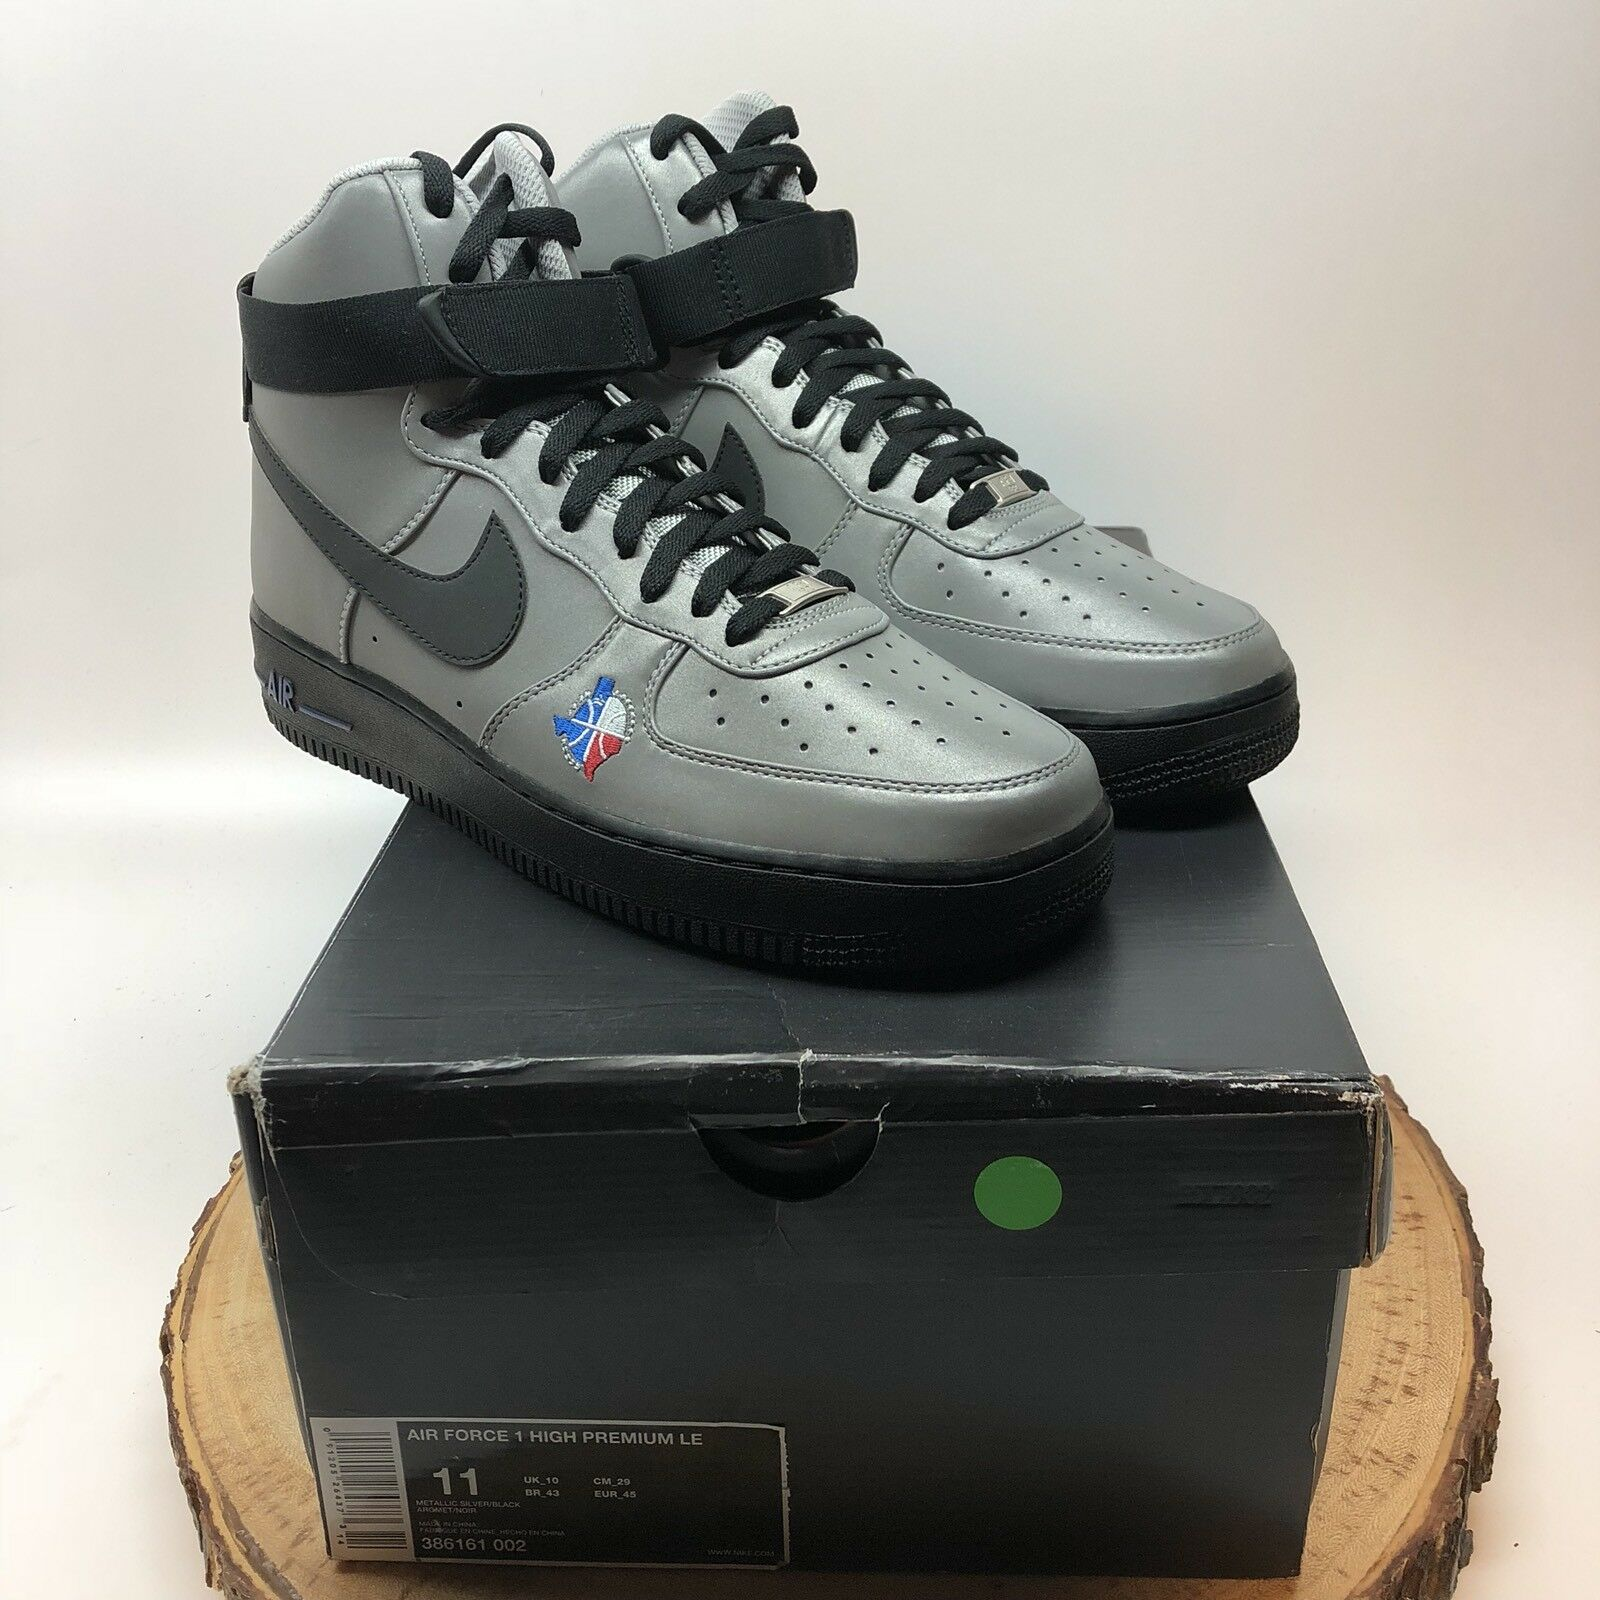 Nike air force one premio le dallas allstar gioco 3m 386161 002 44 jordan